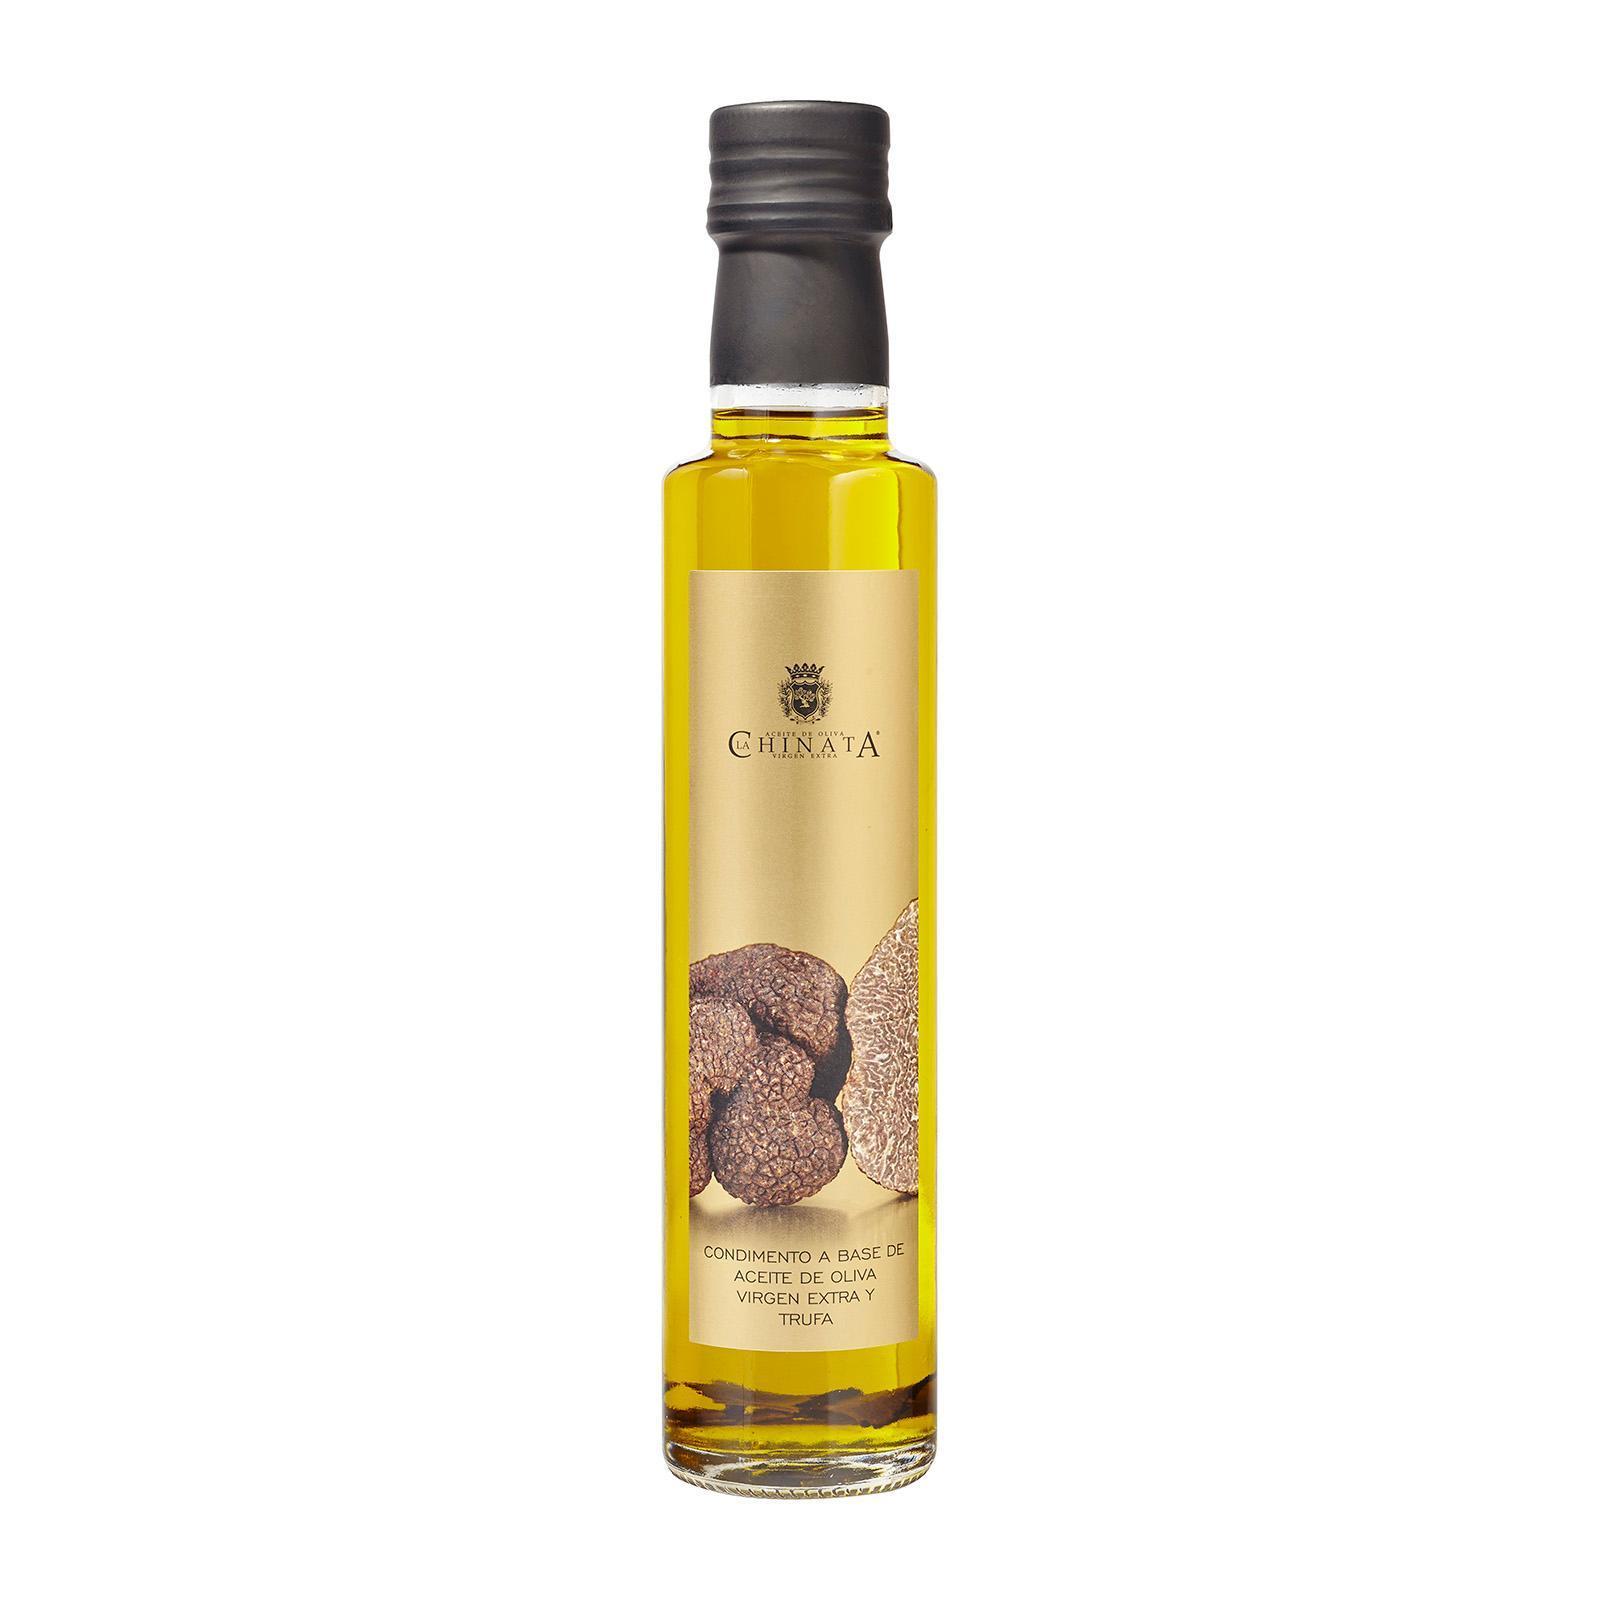 La Chinata Truffle Spanish Extra Virgin Olive Oil - By TANINOS